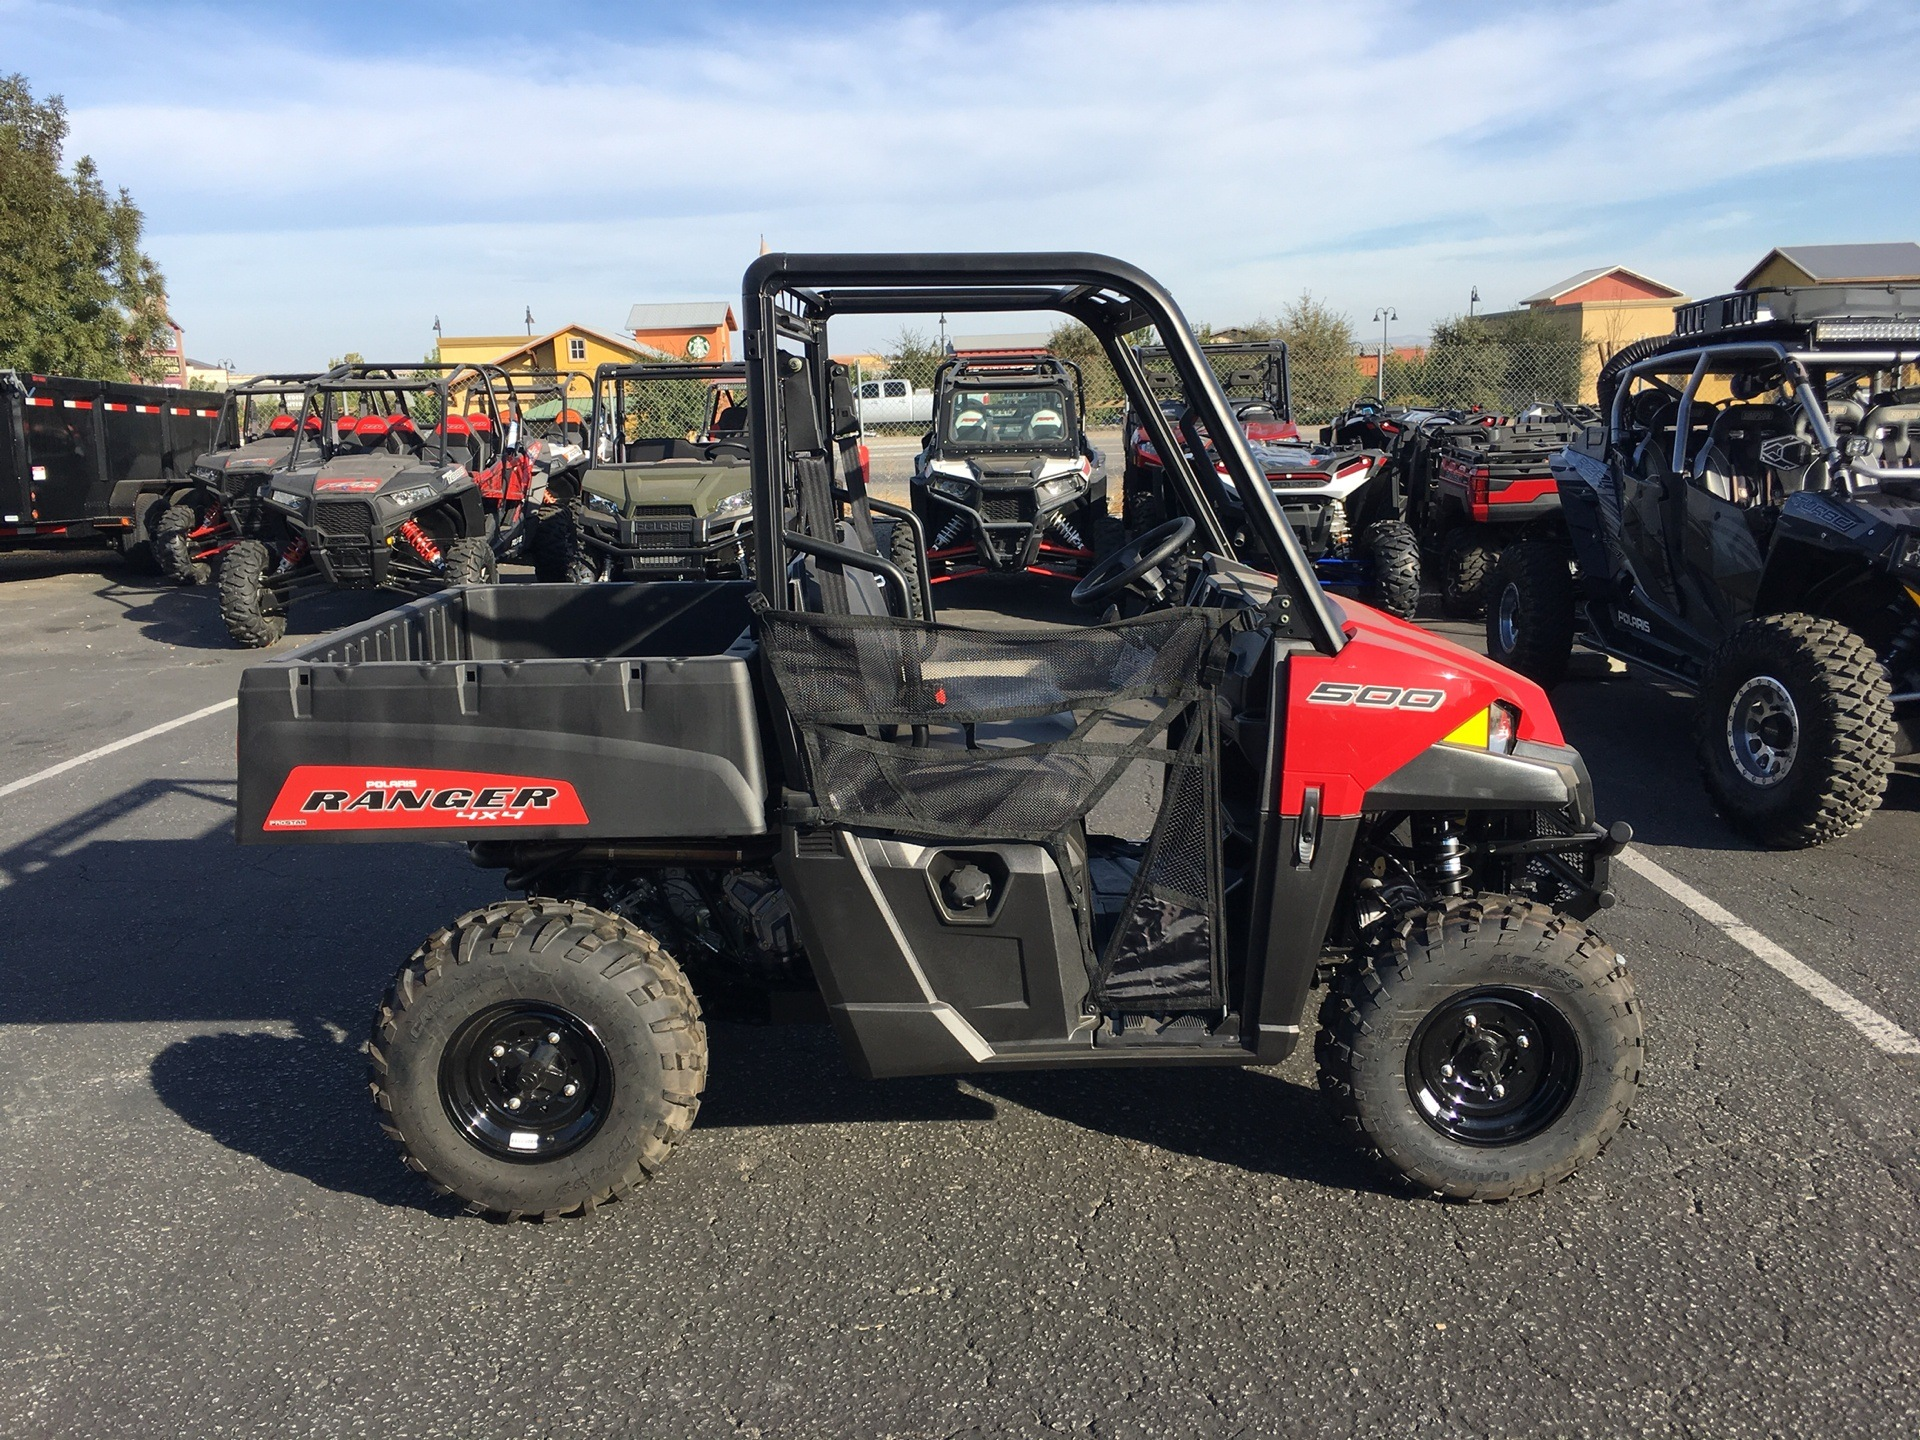 2019 Polaris Ranger 500 for sale 36689